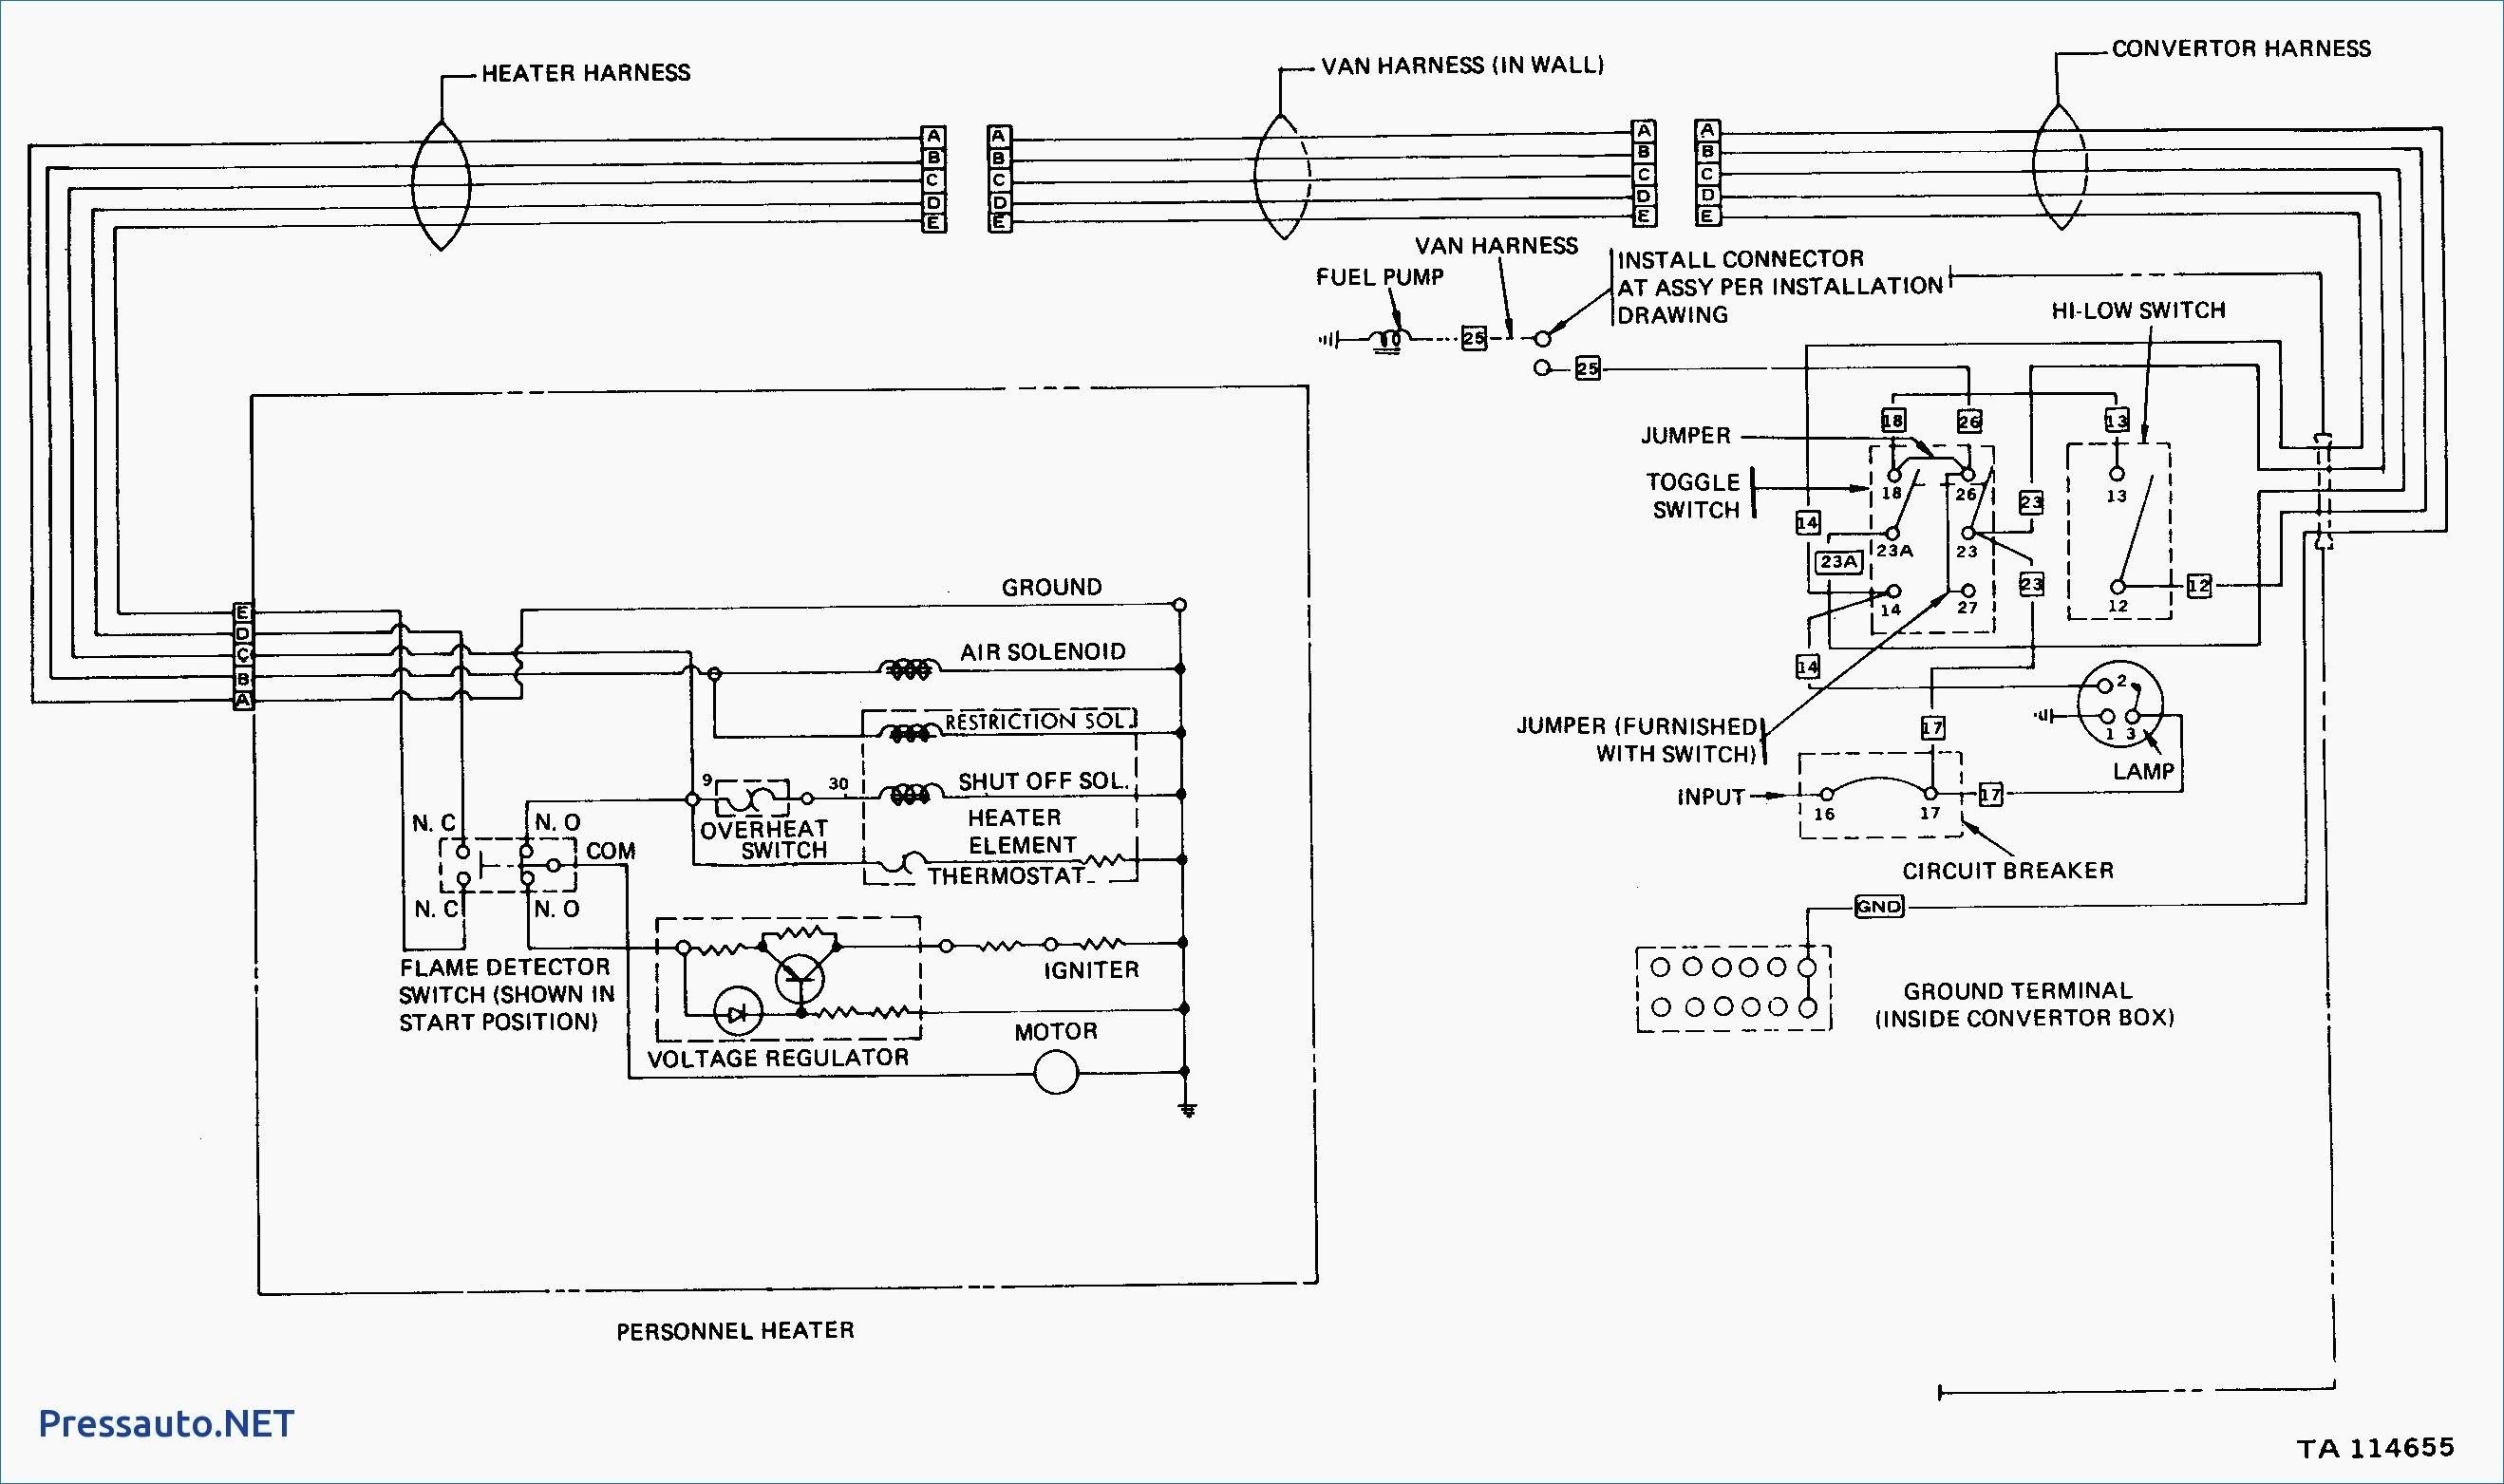 viper 3305v wiring diagram inspirational wiring diagram bulldog security diagrams high beam light wiring of viper 3305v wiring diagram